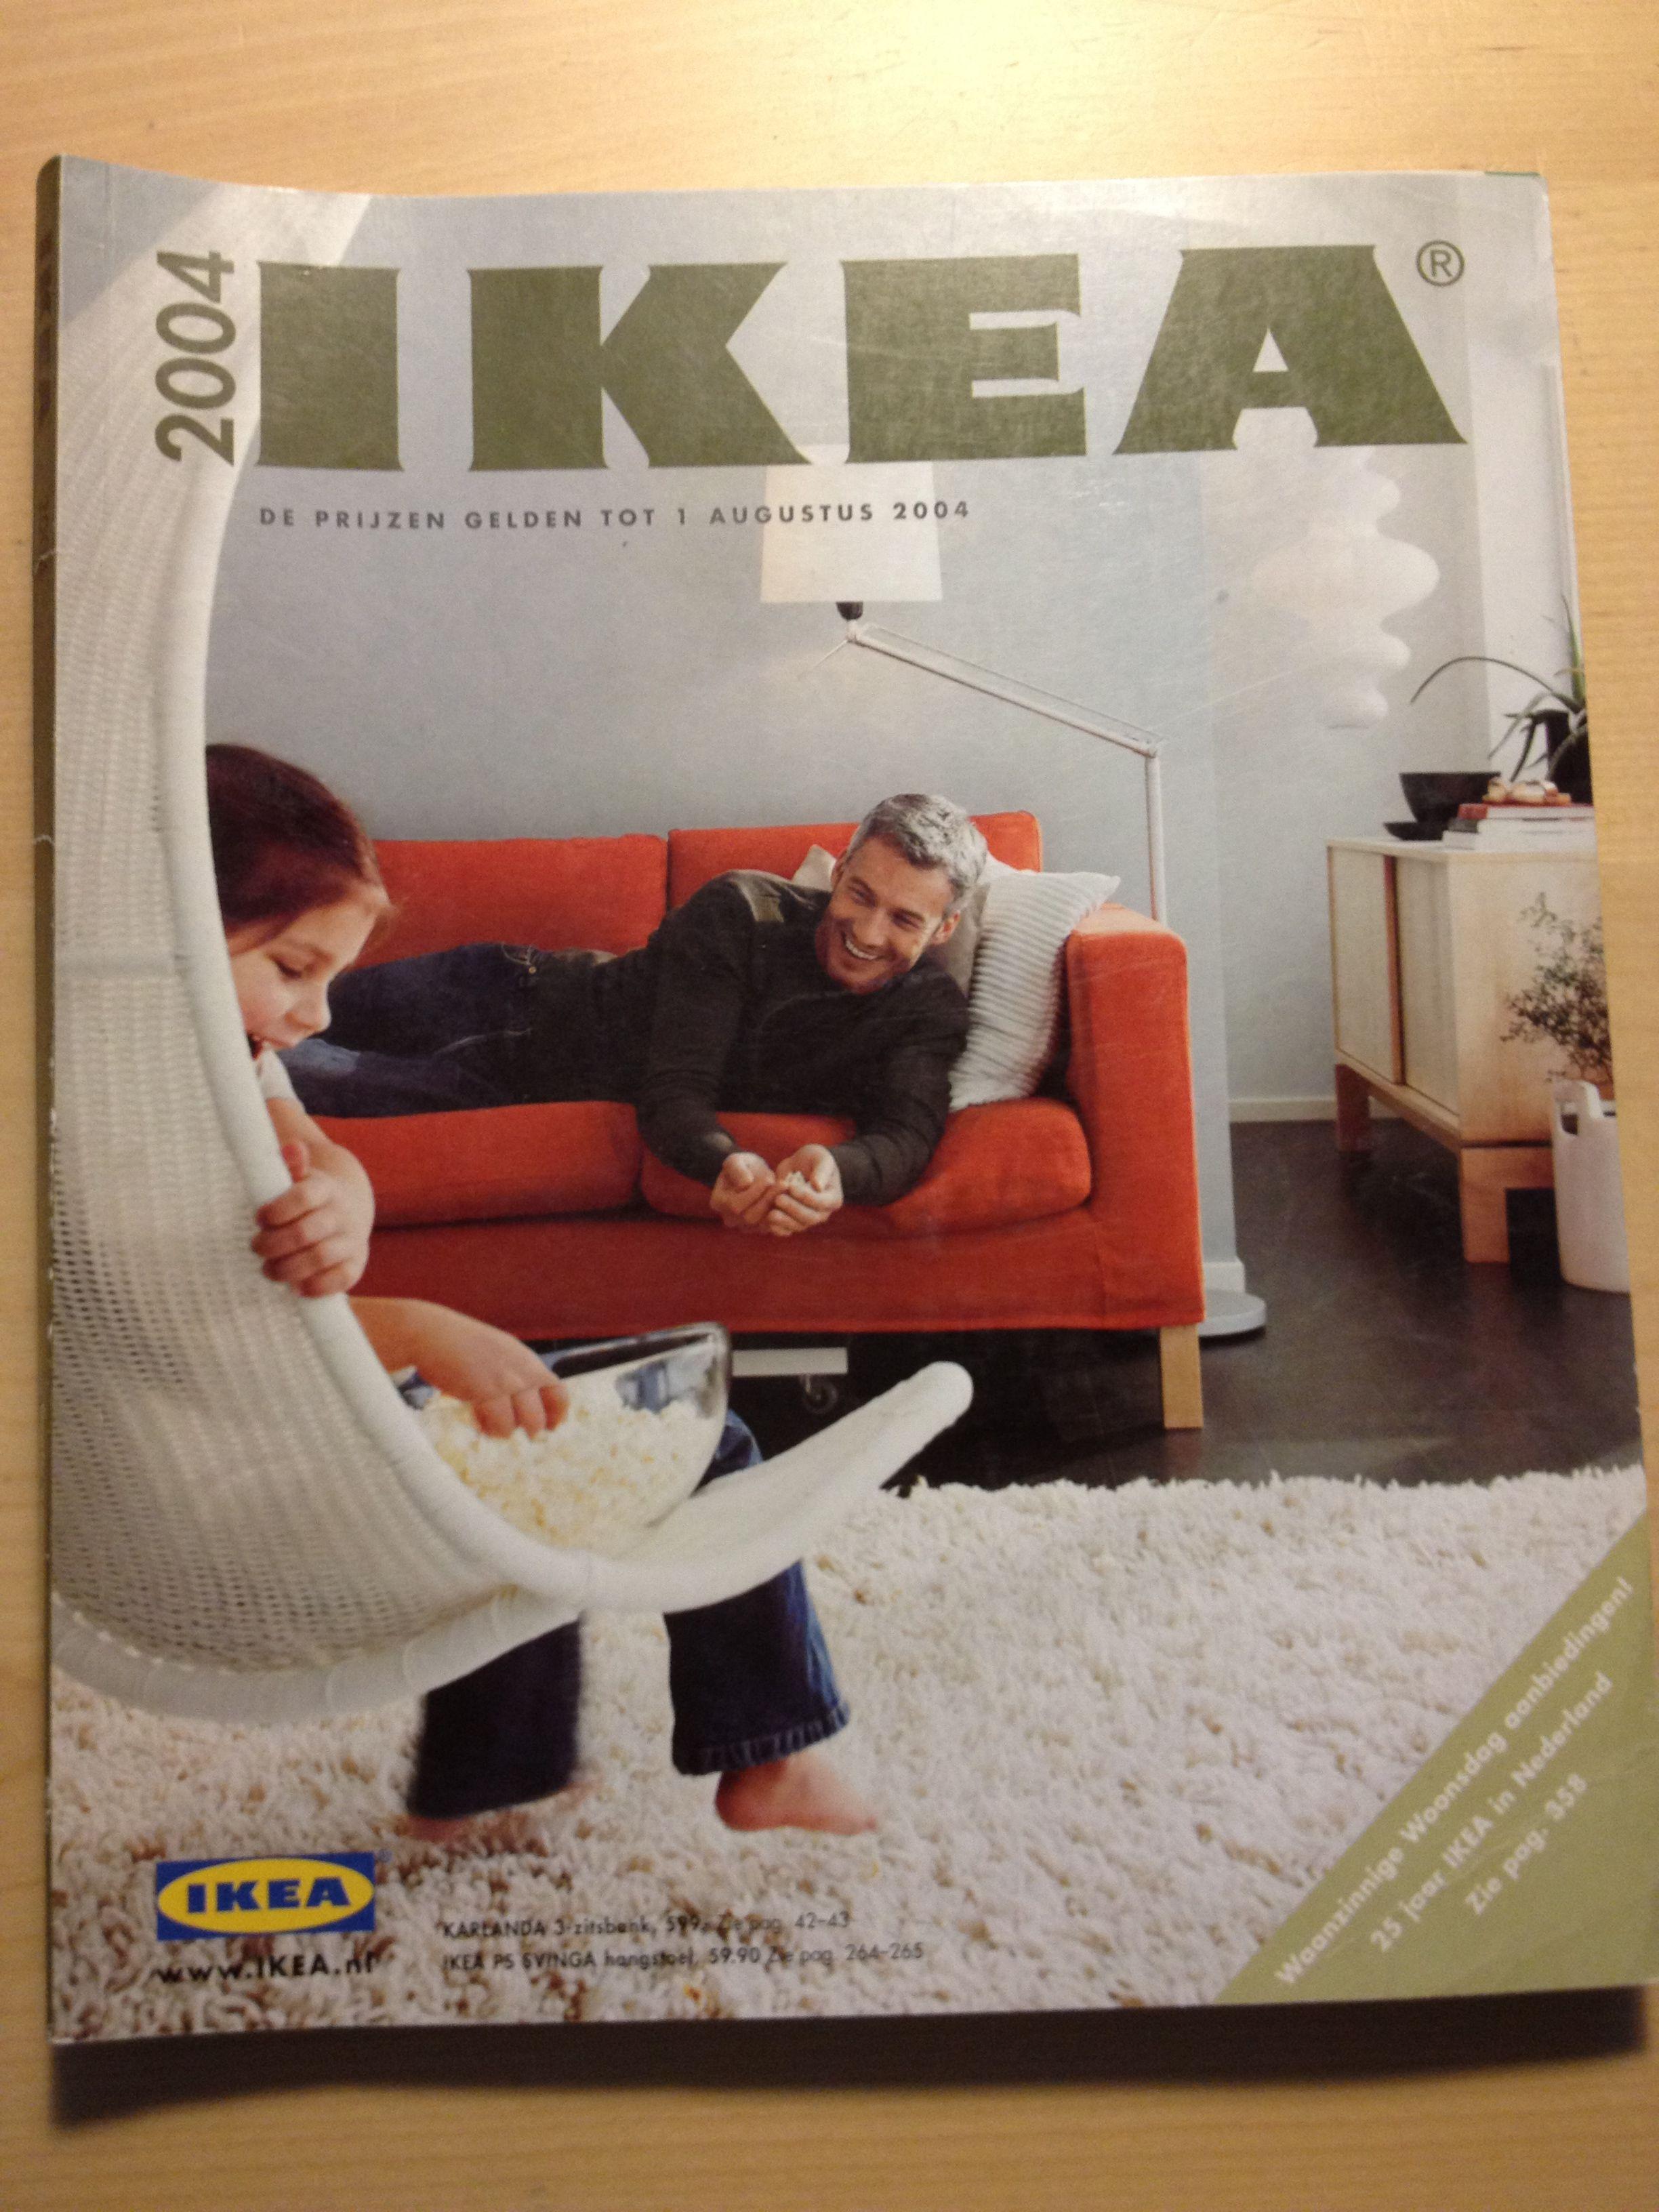 DecorFurniture Ikea Catalog Catalogue 2004Year IkeaHome qzSUMVp